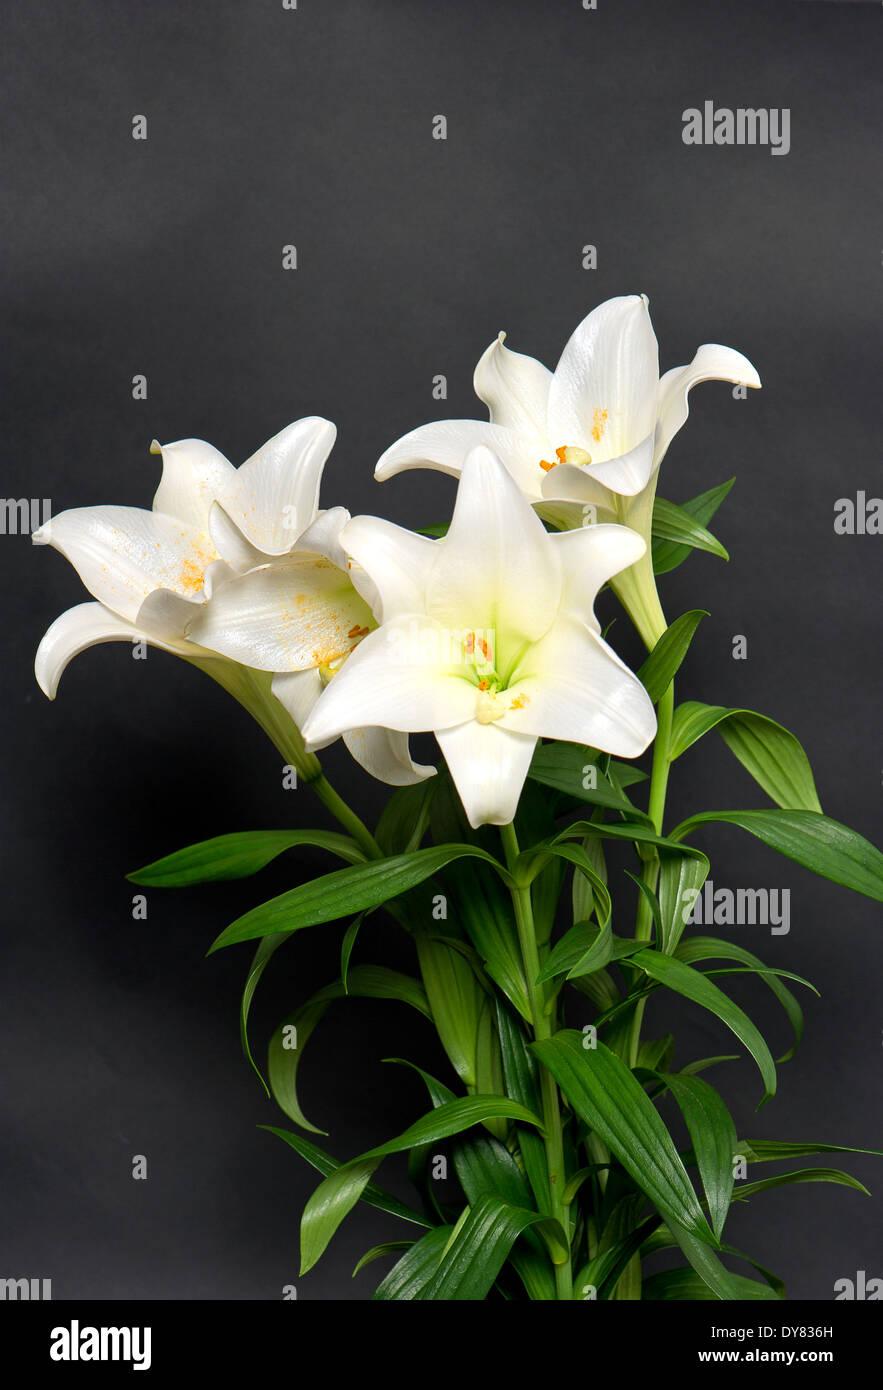 White lily flowers bouquet on black background stock photo 68404969 white lily flowers bouquet on black background izmirmasajfo